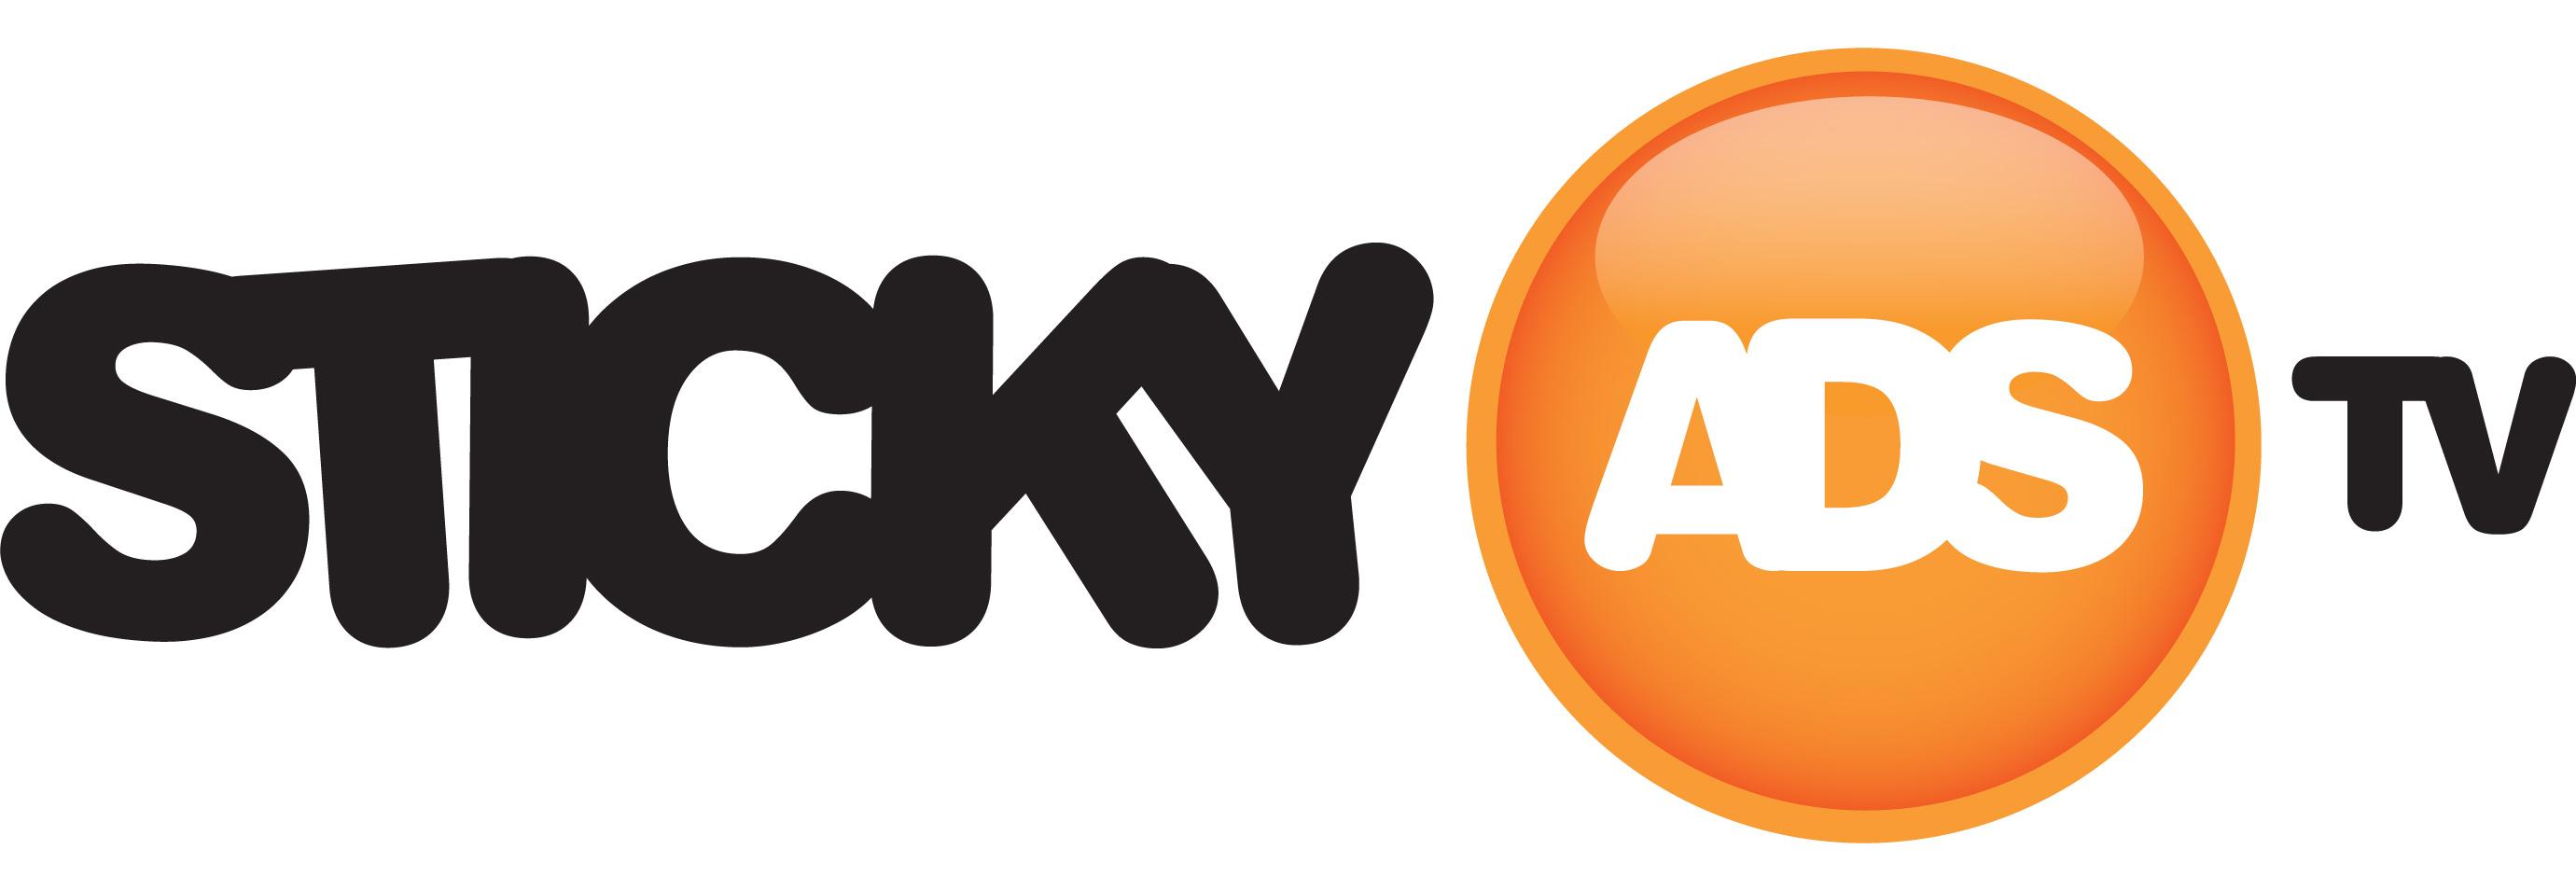 https://i2.wp.com/frenchweb.fr/wp-content/uploads/2011/05/logo-StickyADStv.jpg